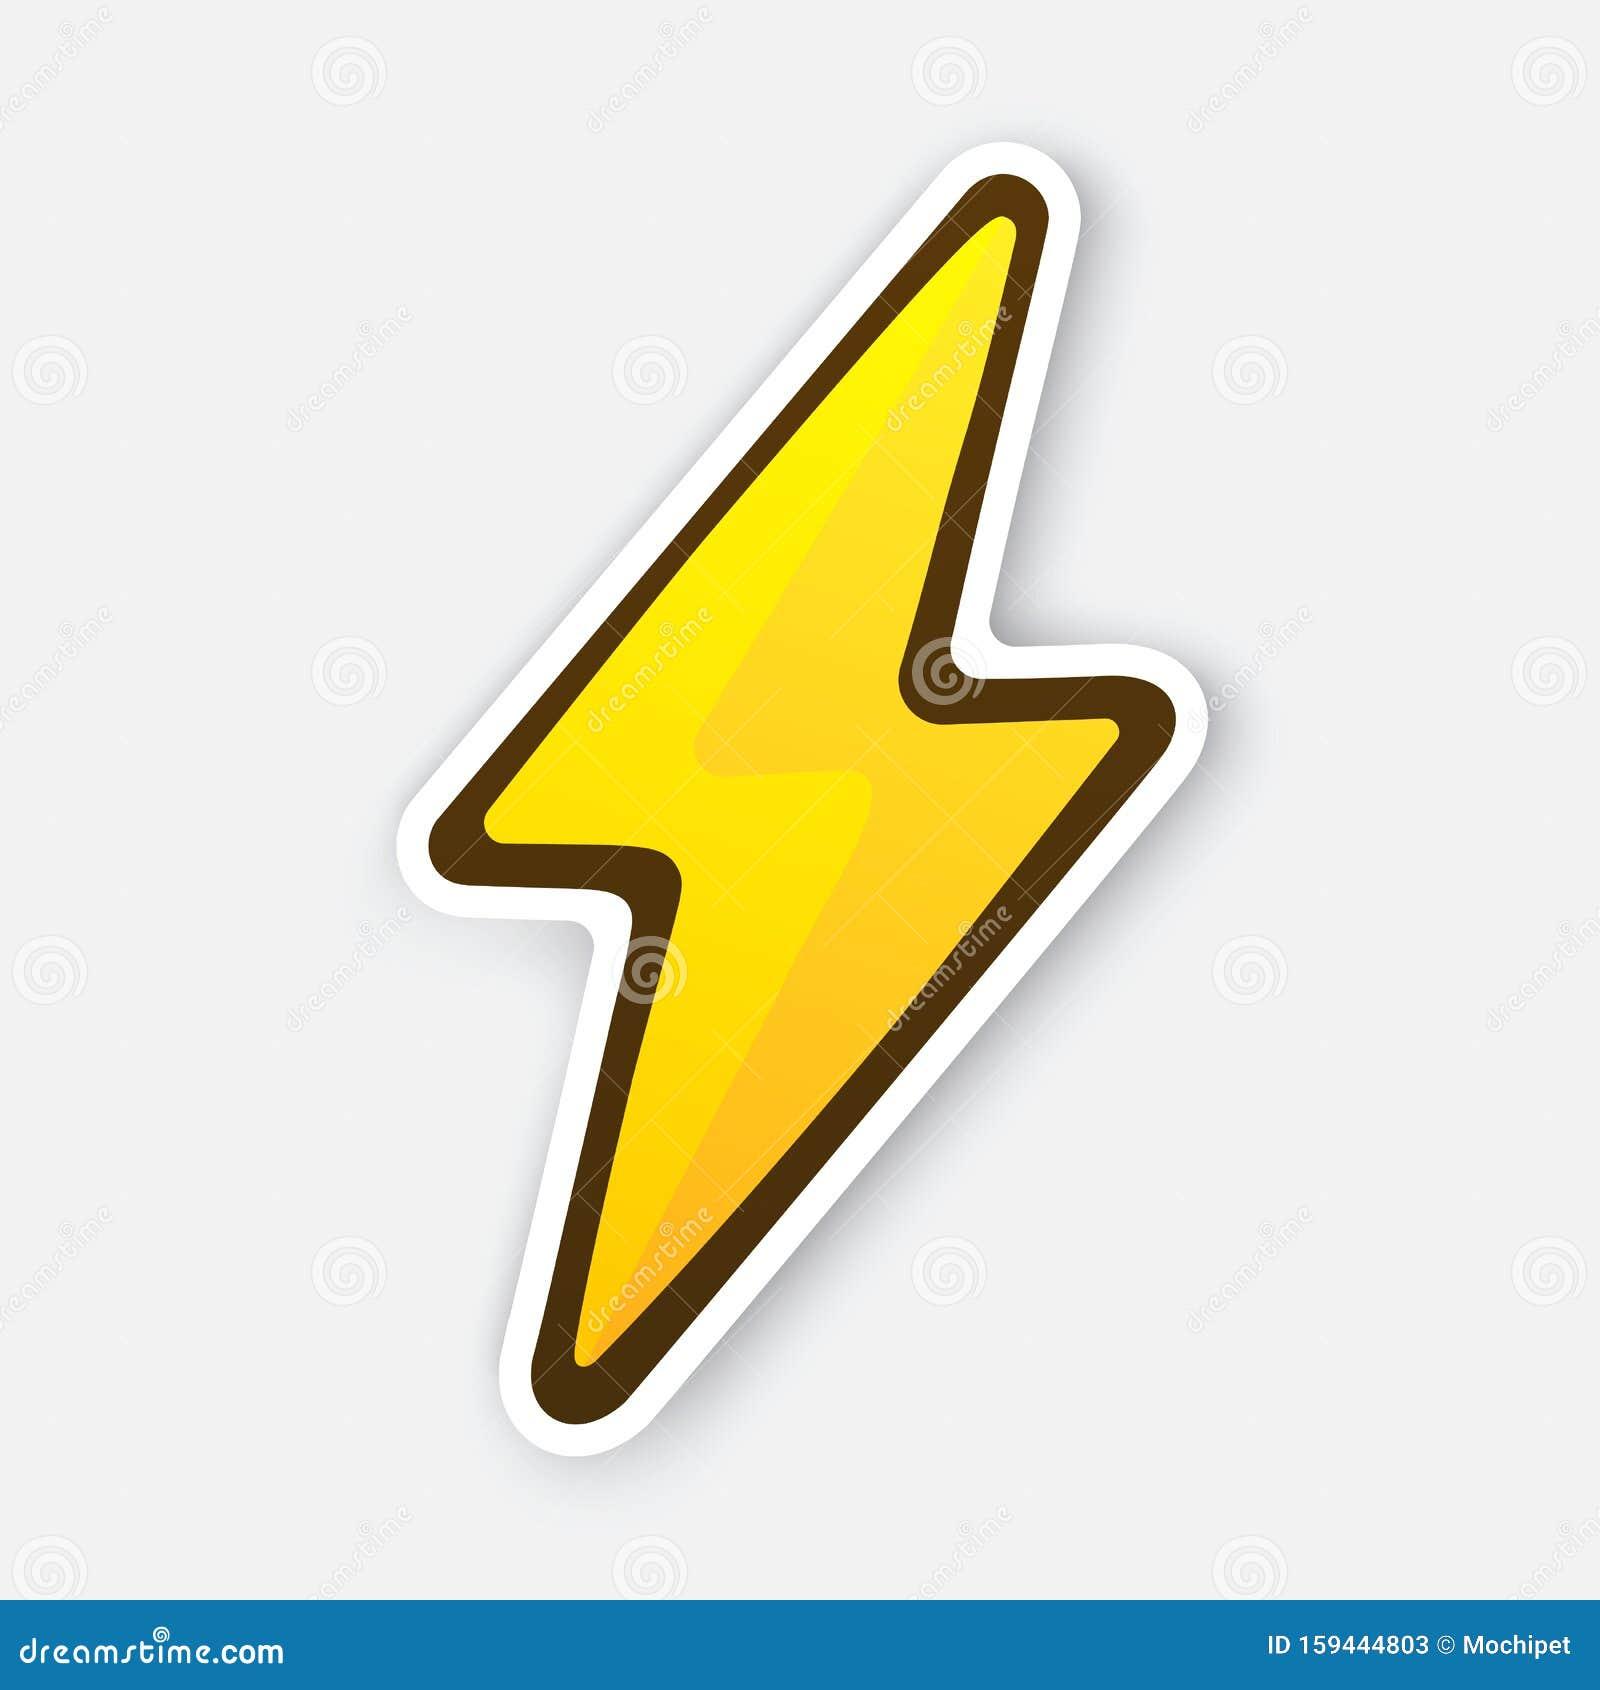 25 Vector Illustration. Electric Lightning Bolt. Thunderbolt Strike ...